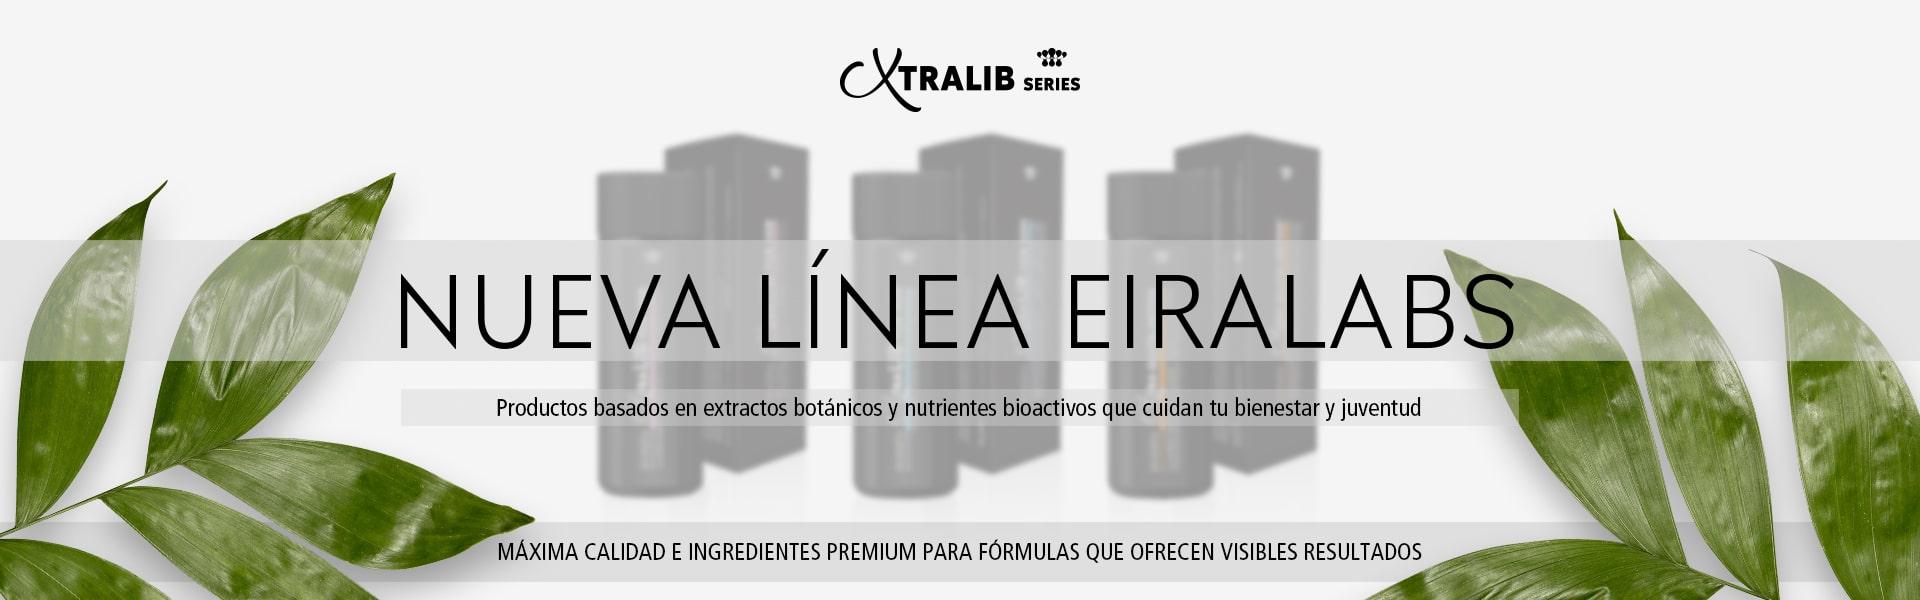 slide-presentacion-xtralib-001